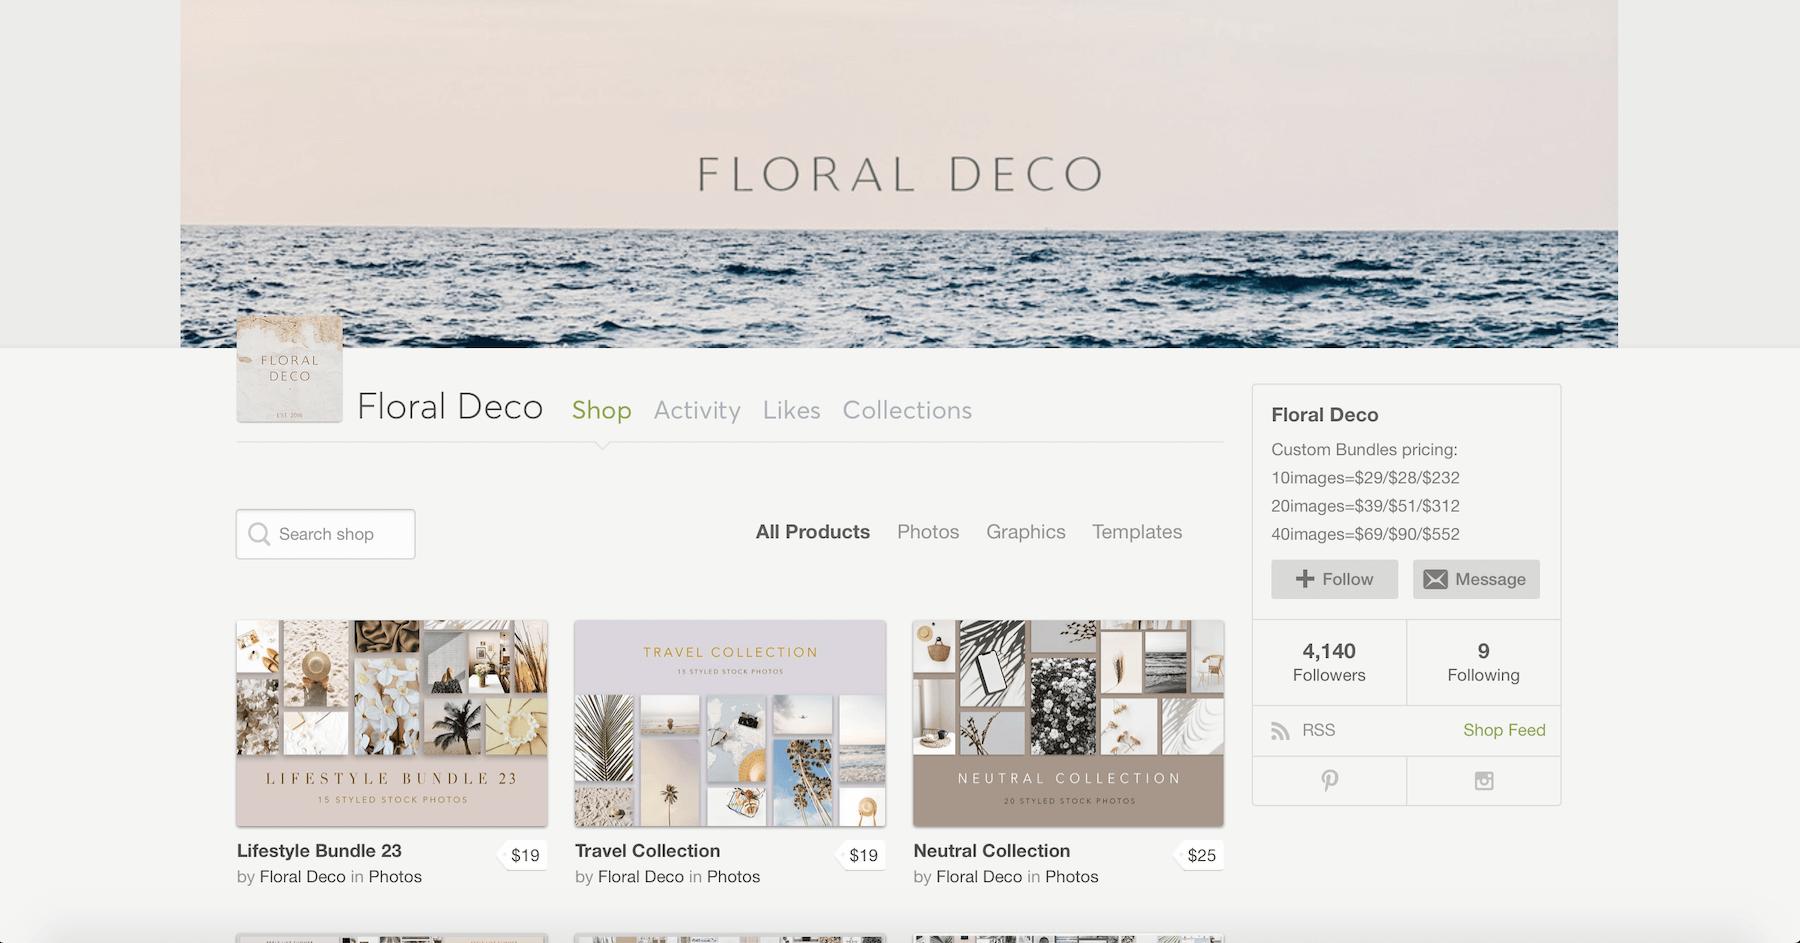 Floral Deco - Premium Lifestyle Stock Photos